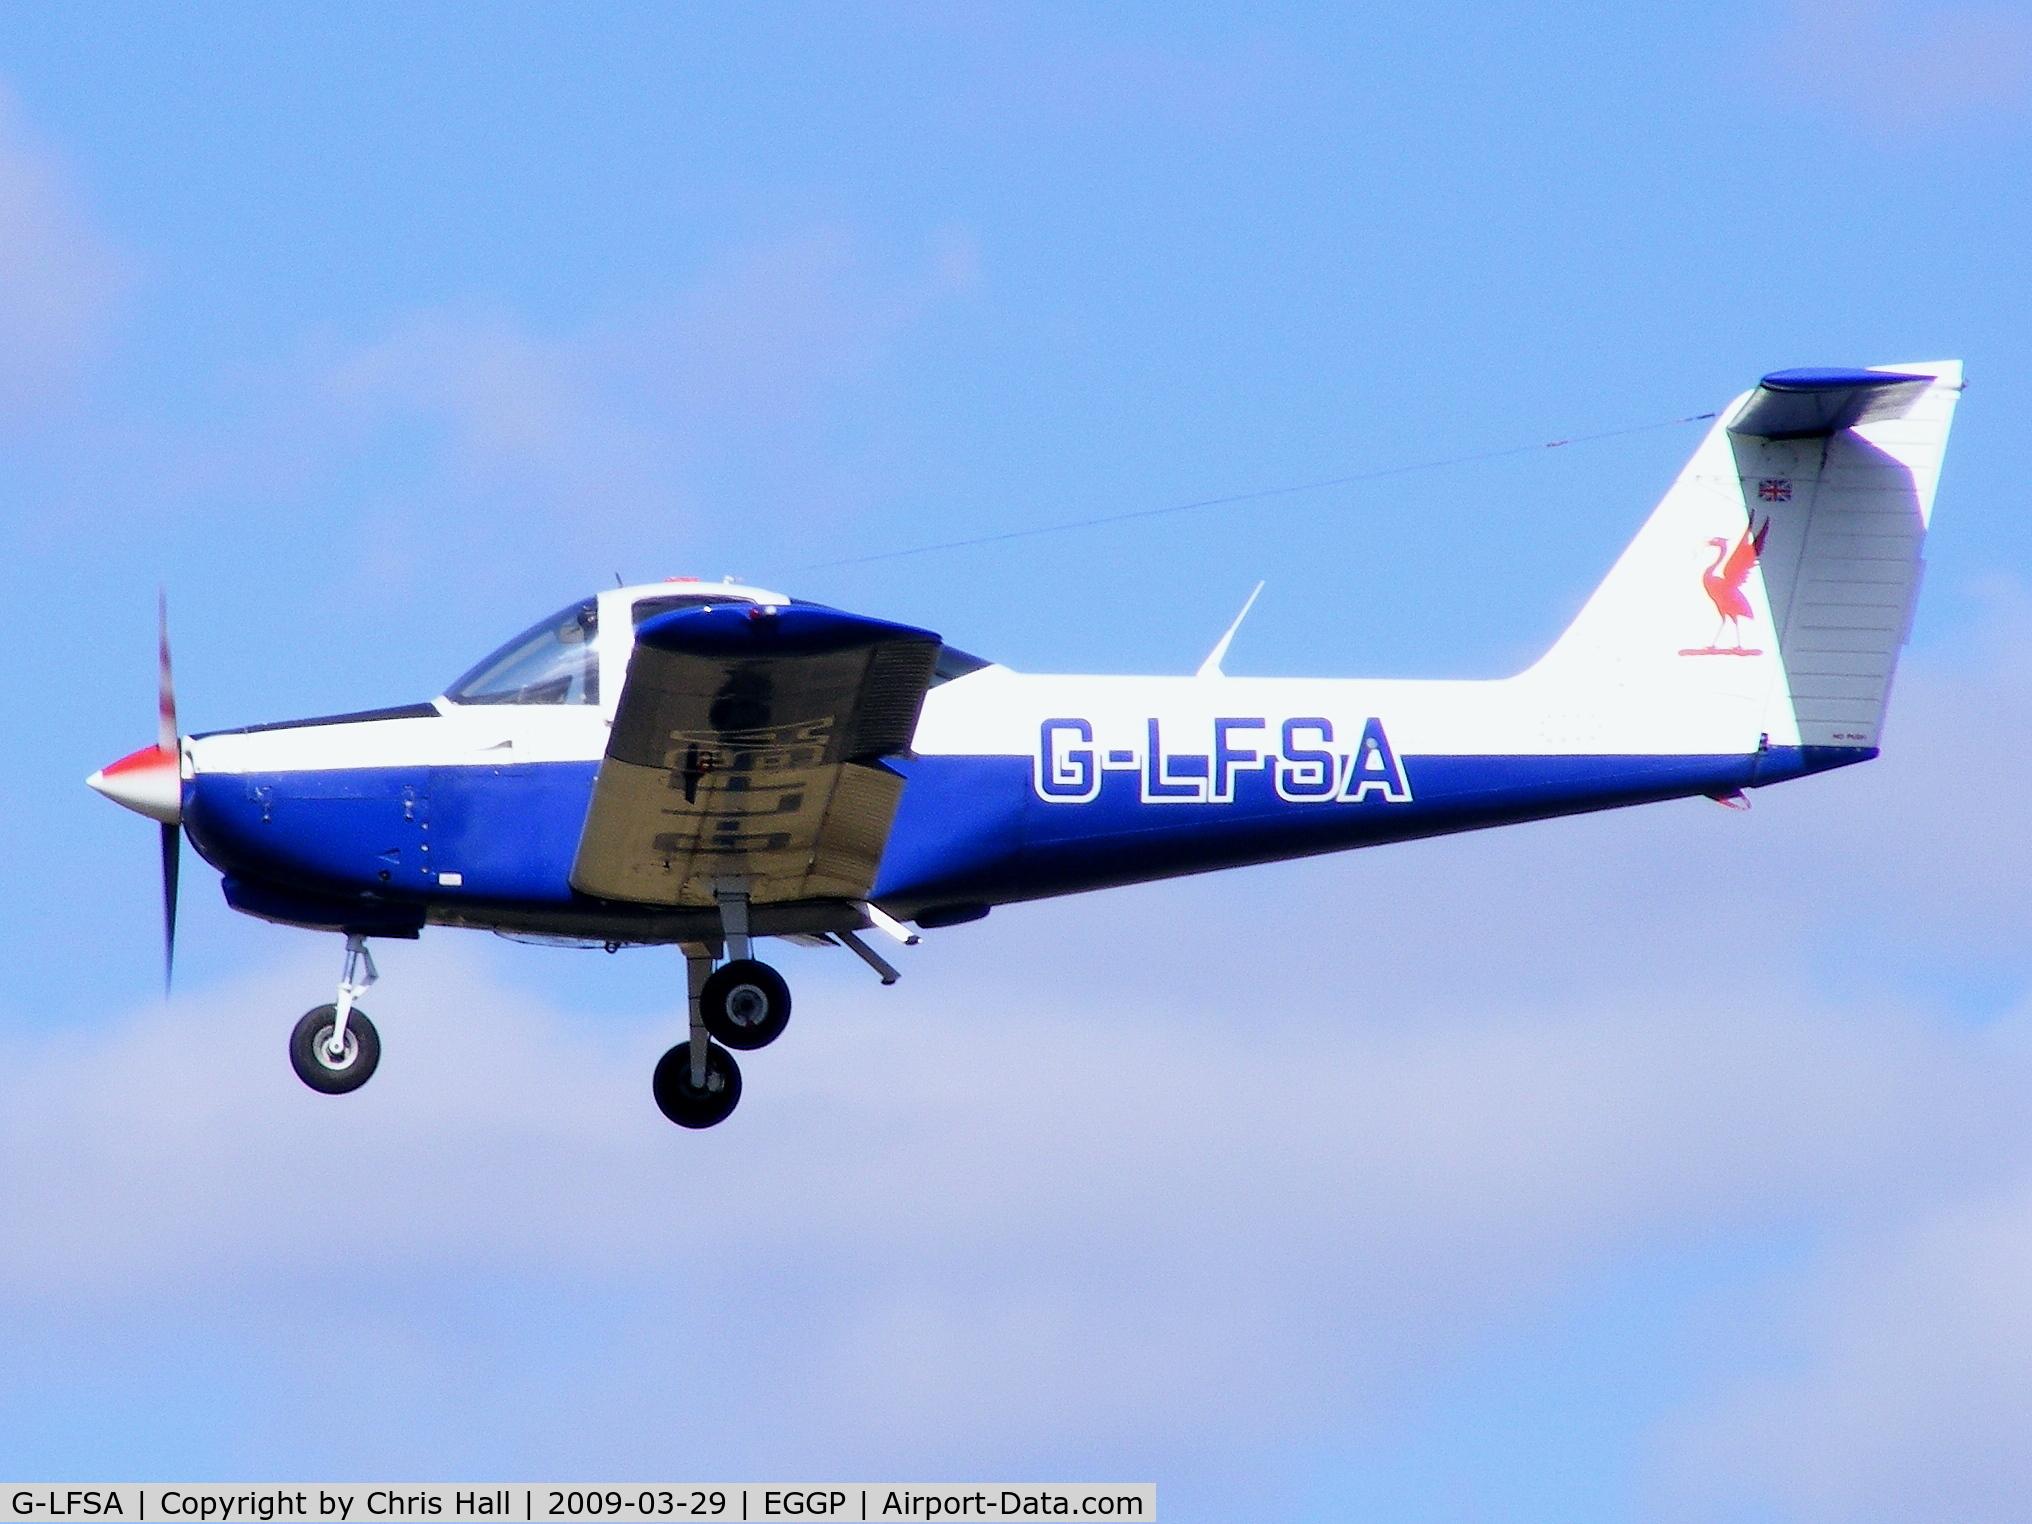 G-LFSA, 1978 Piper PA-38-112 Tomahawk Tomahawk C/N 38-78A0430, Liverpool Flying School